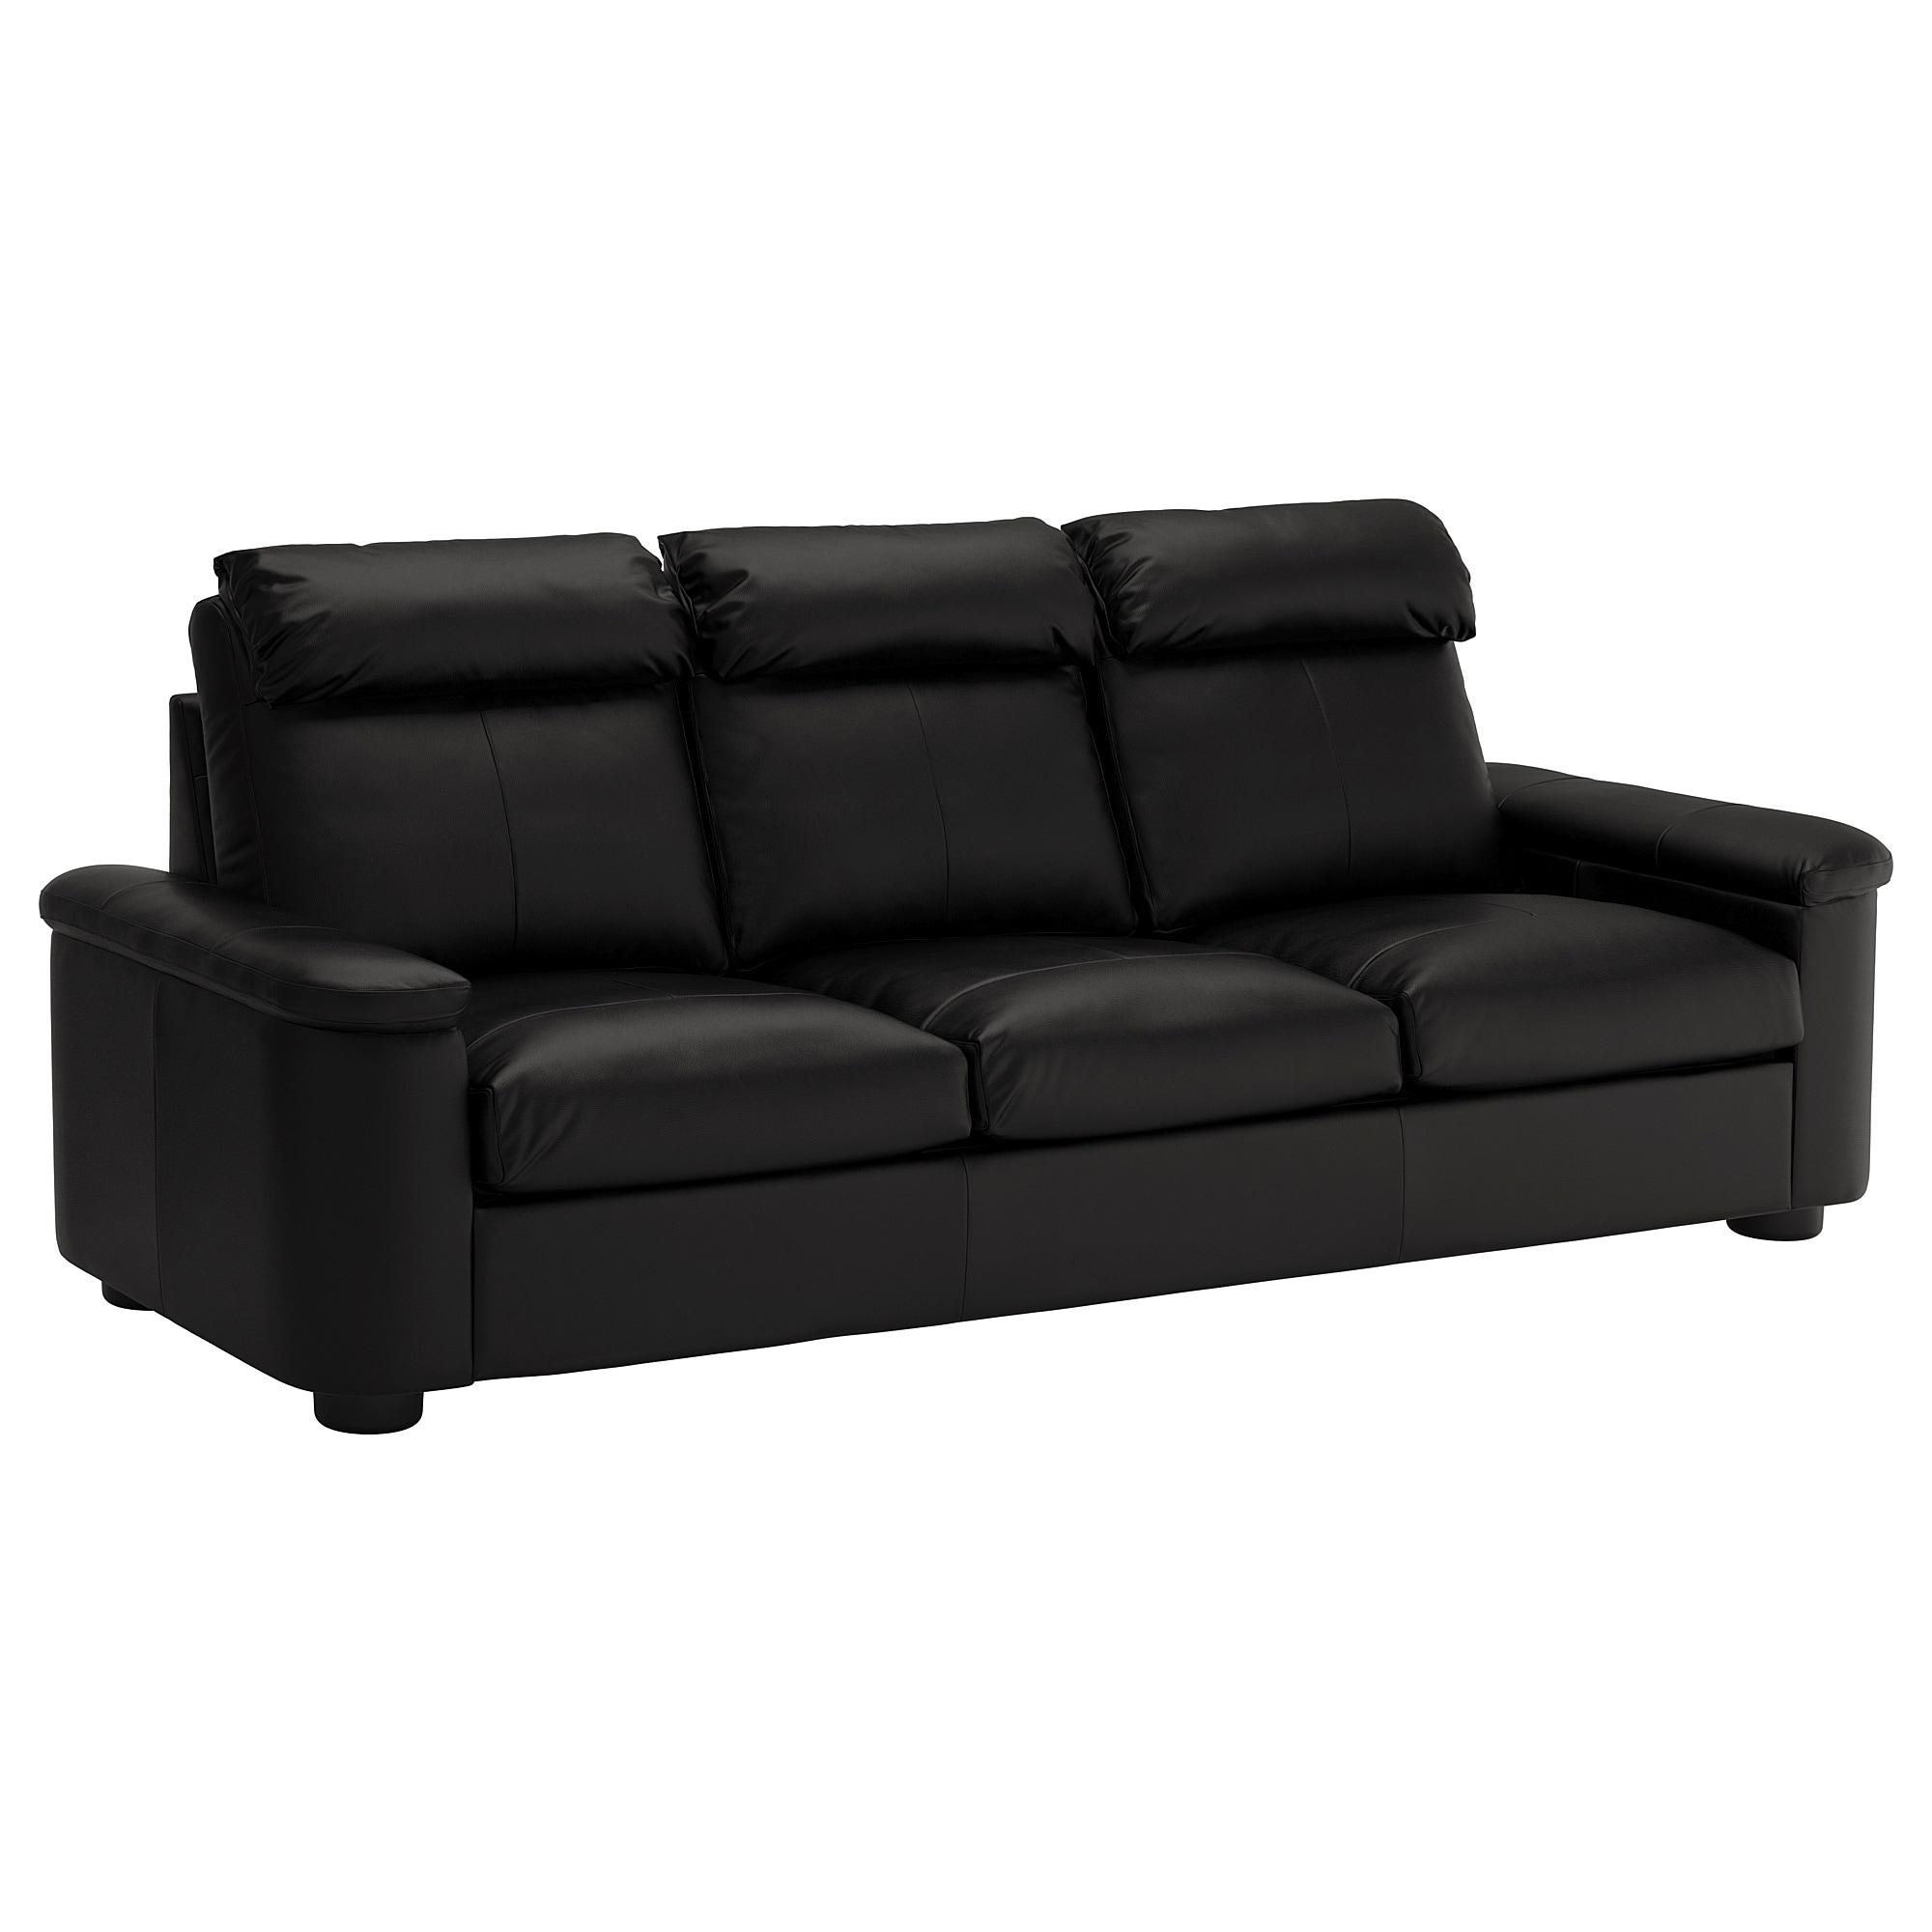 Sofas De Piel Ofertas T8dj sofà S De Piel Y De Piel Sintà Tica Pra Online Ikea